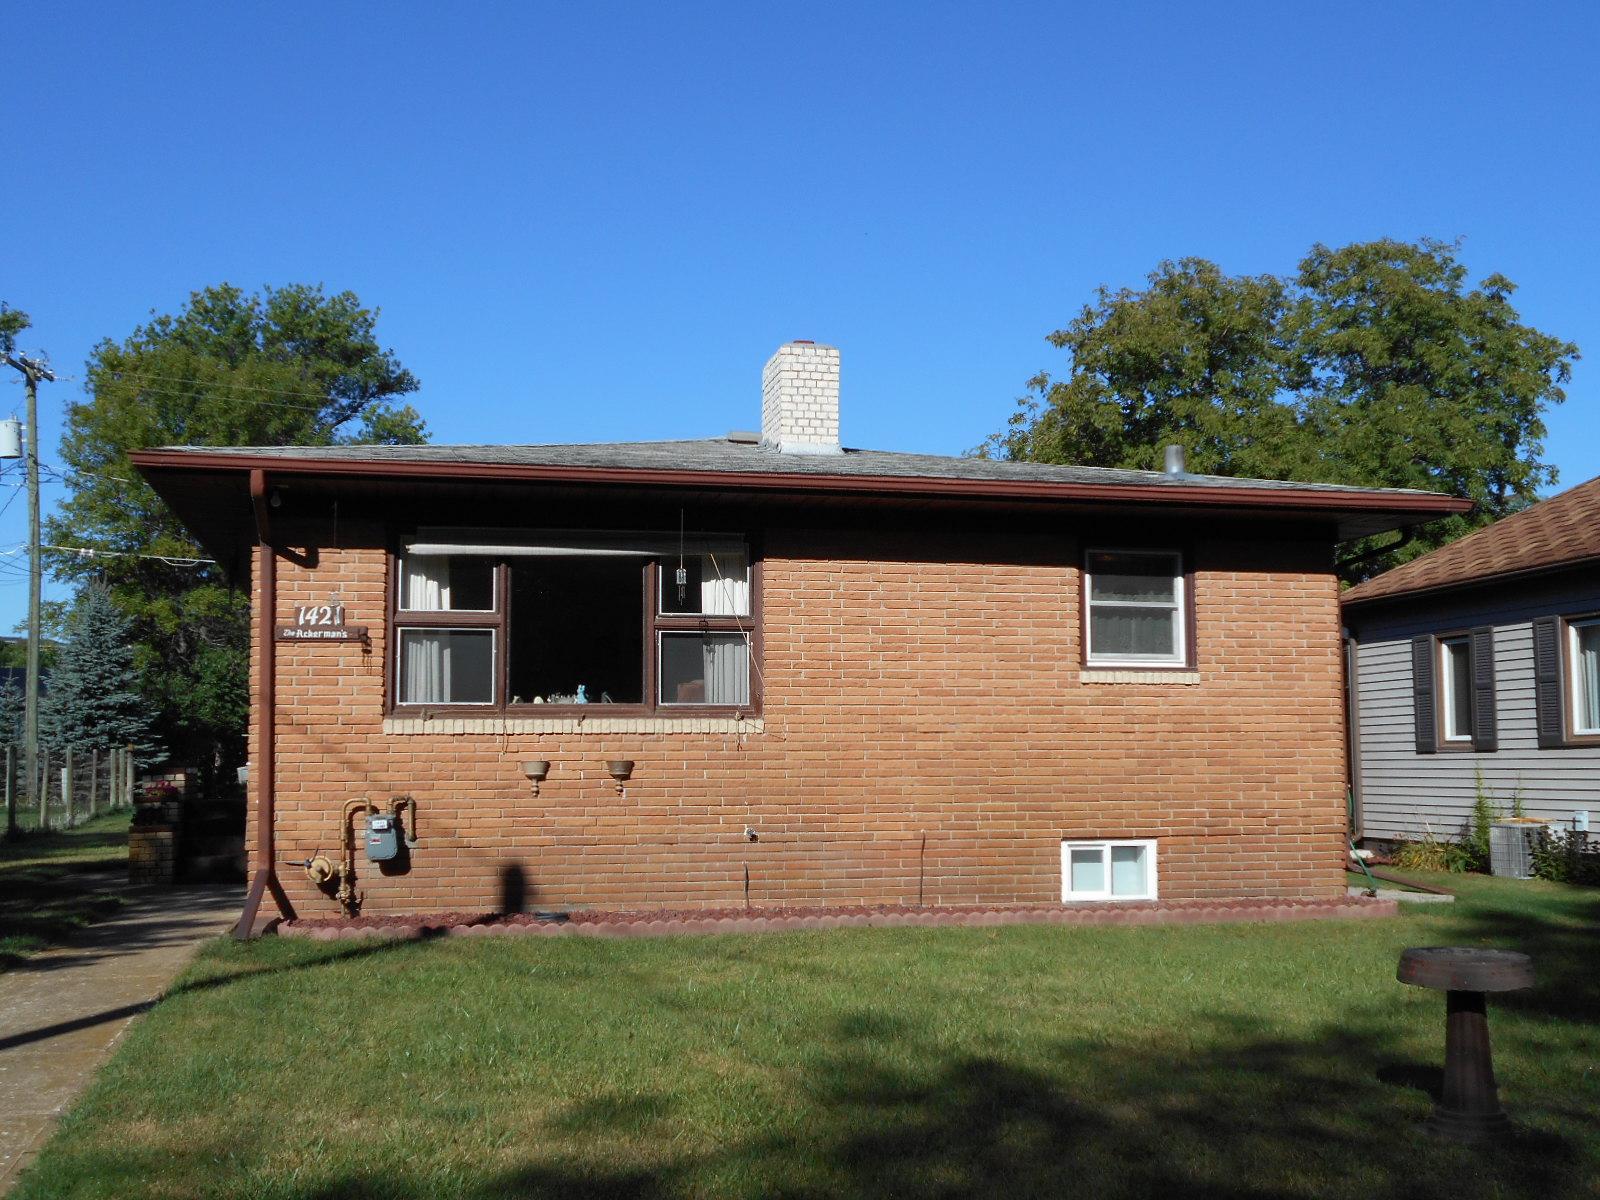 1421 3rd Ave NW, Jamestown, North Dakota 58401